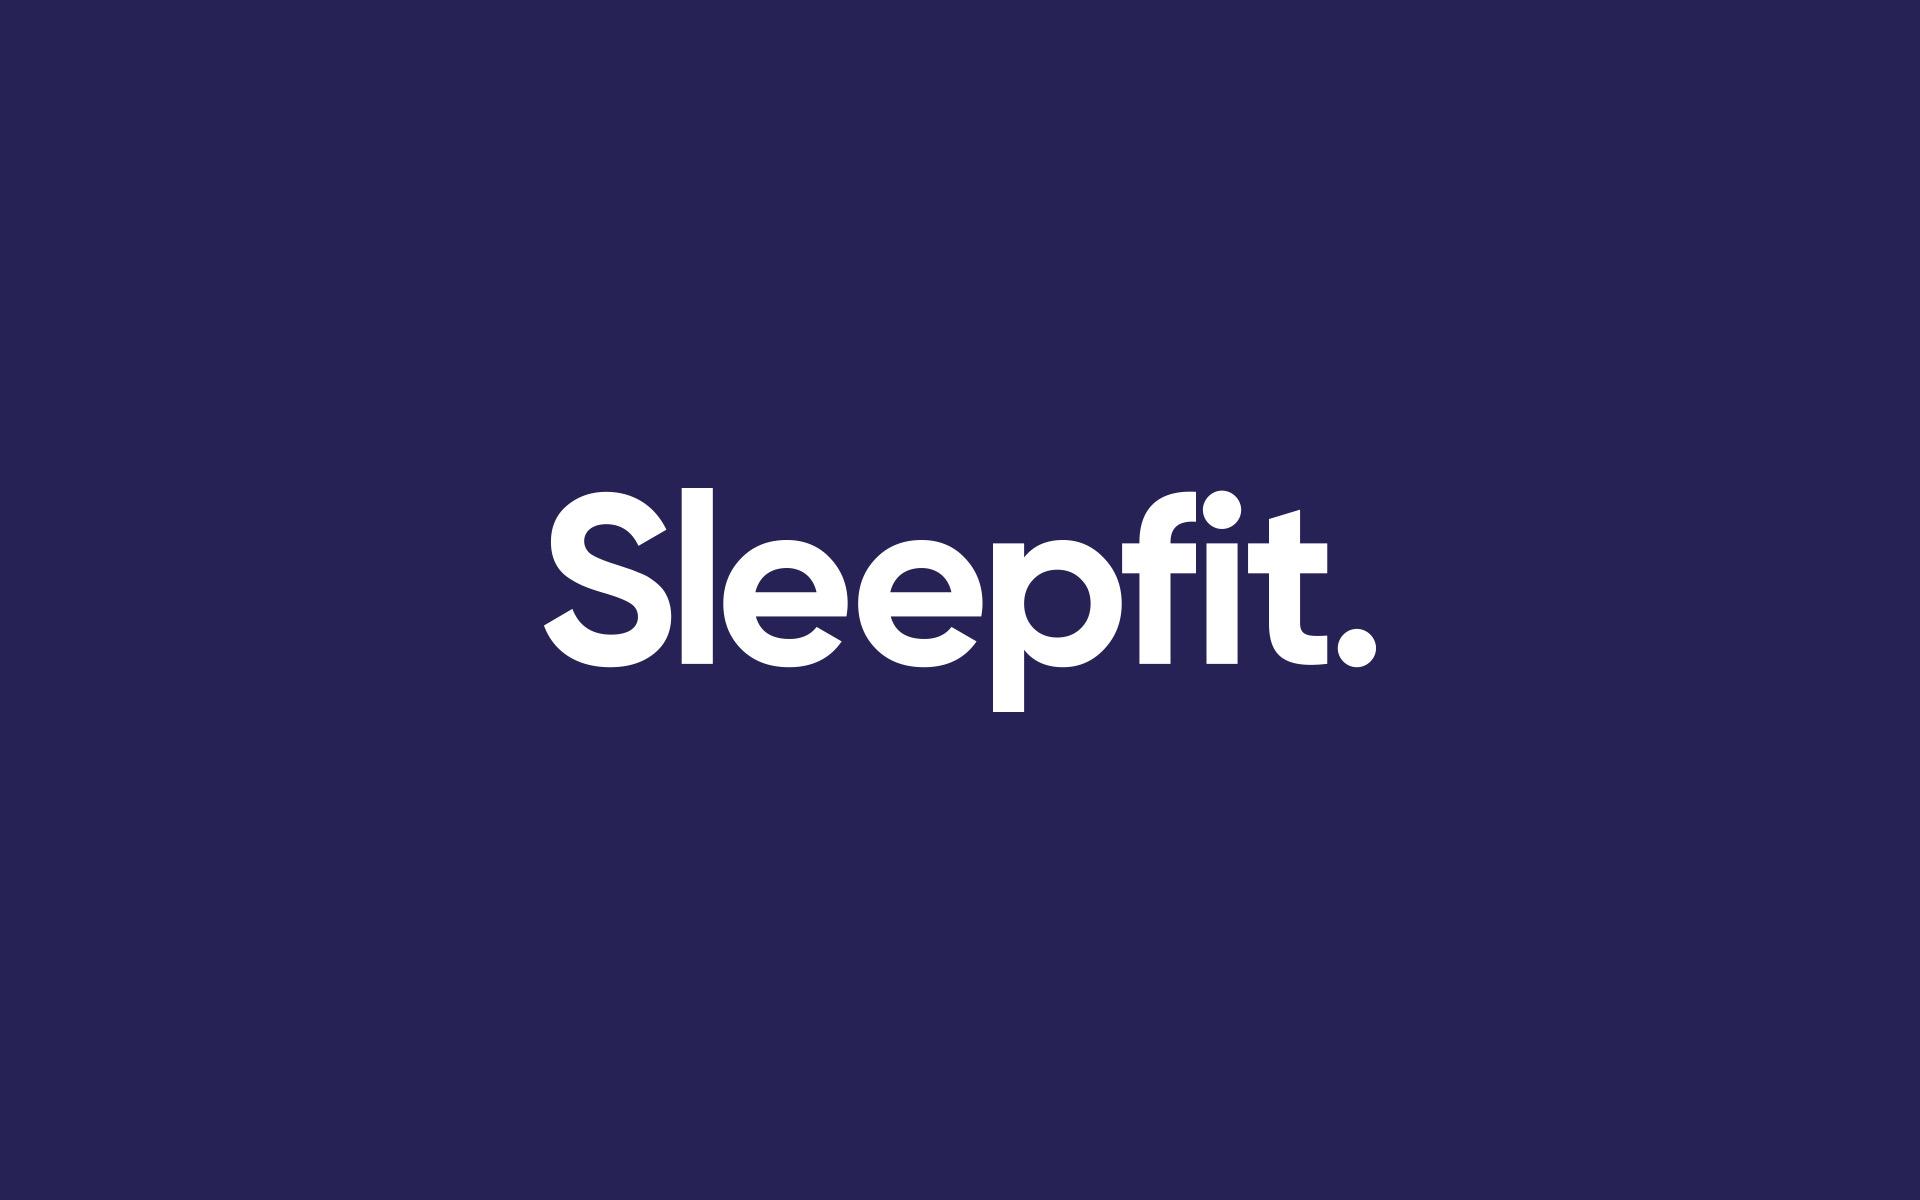 sleepfit-logo.jpg